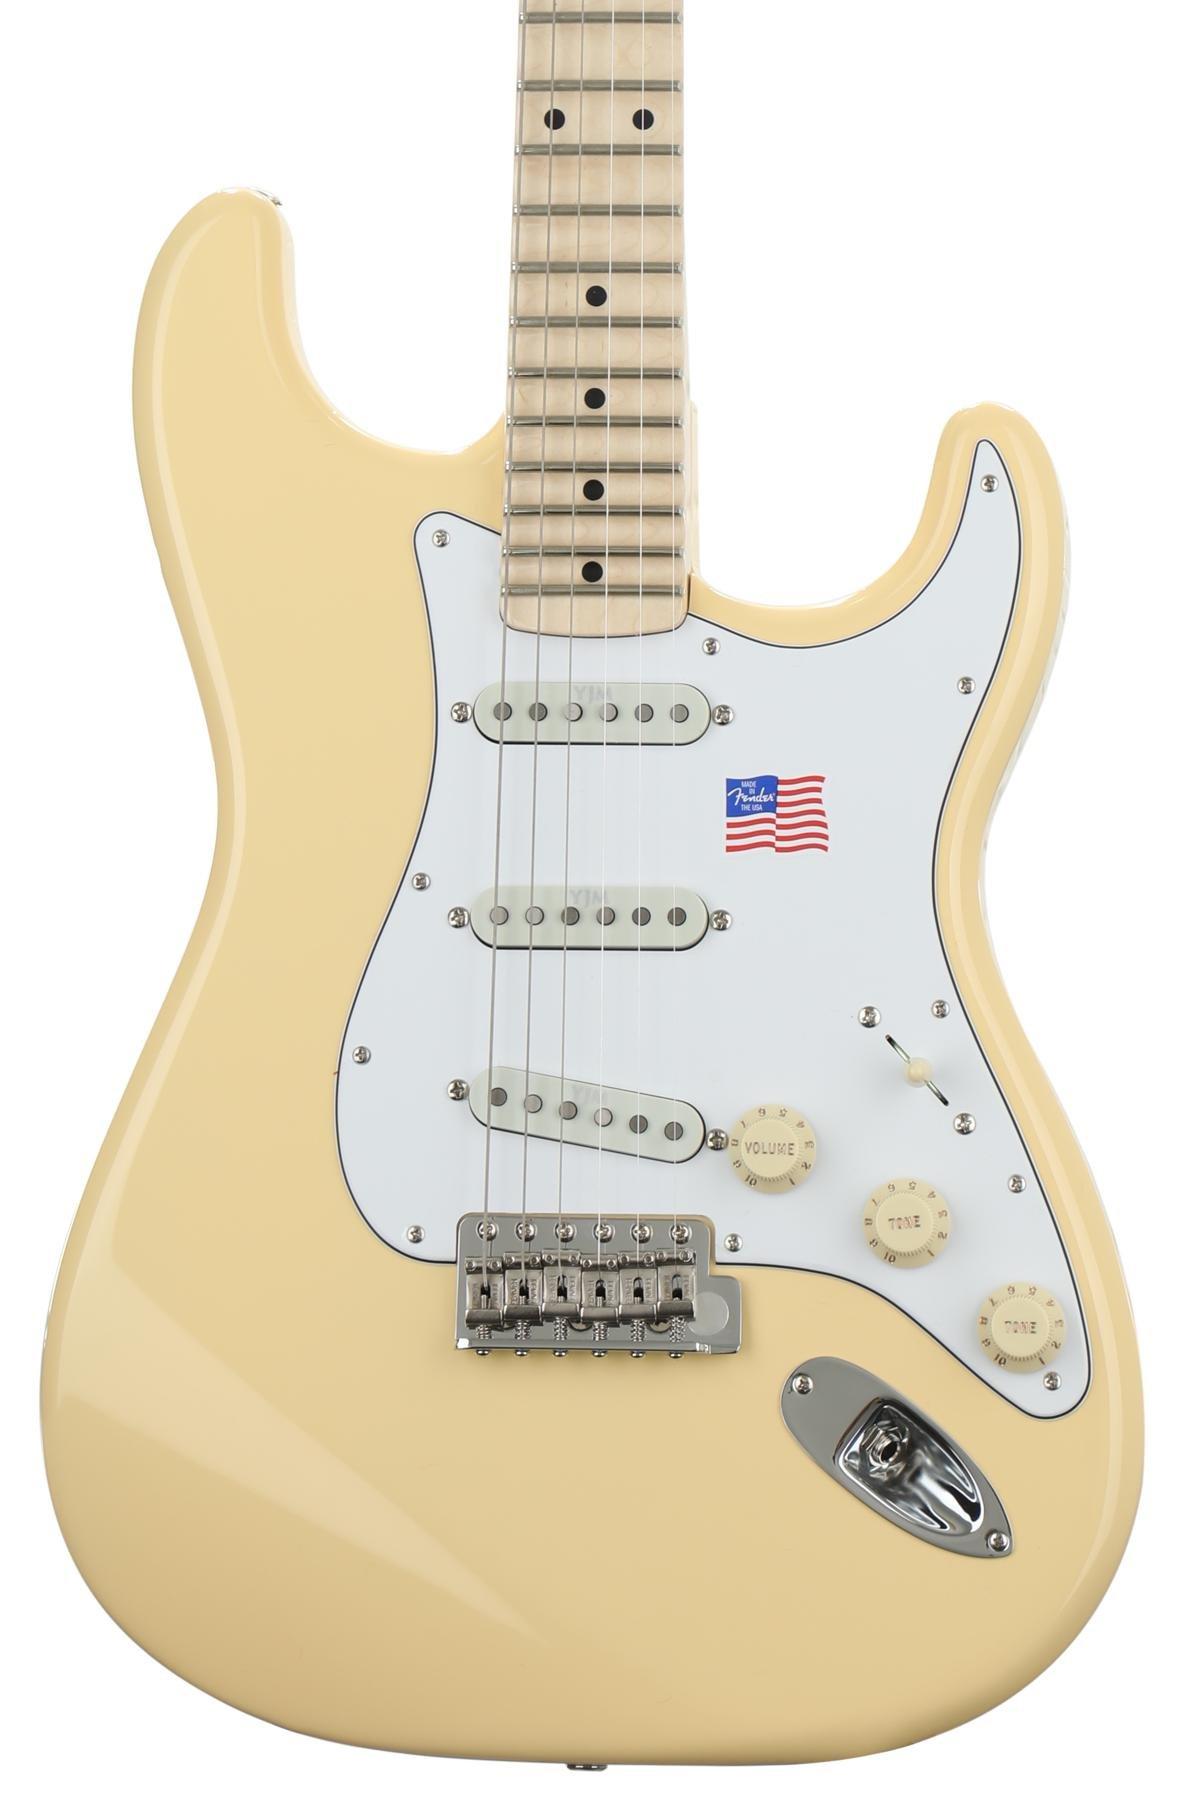 Fender Yngwie Malmsteen Stratocaster Vintage White w Maple